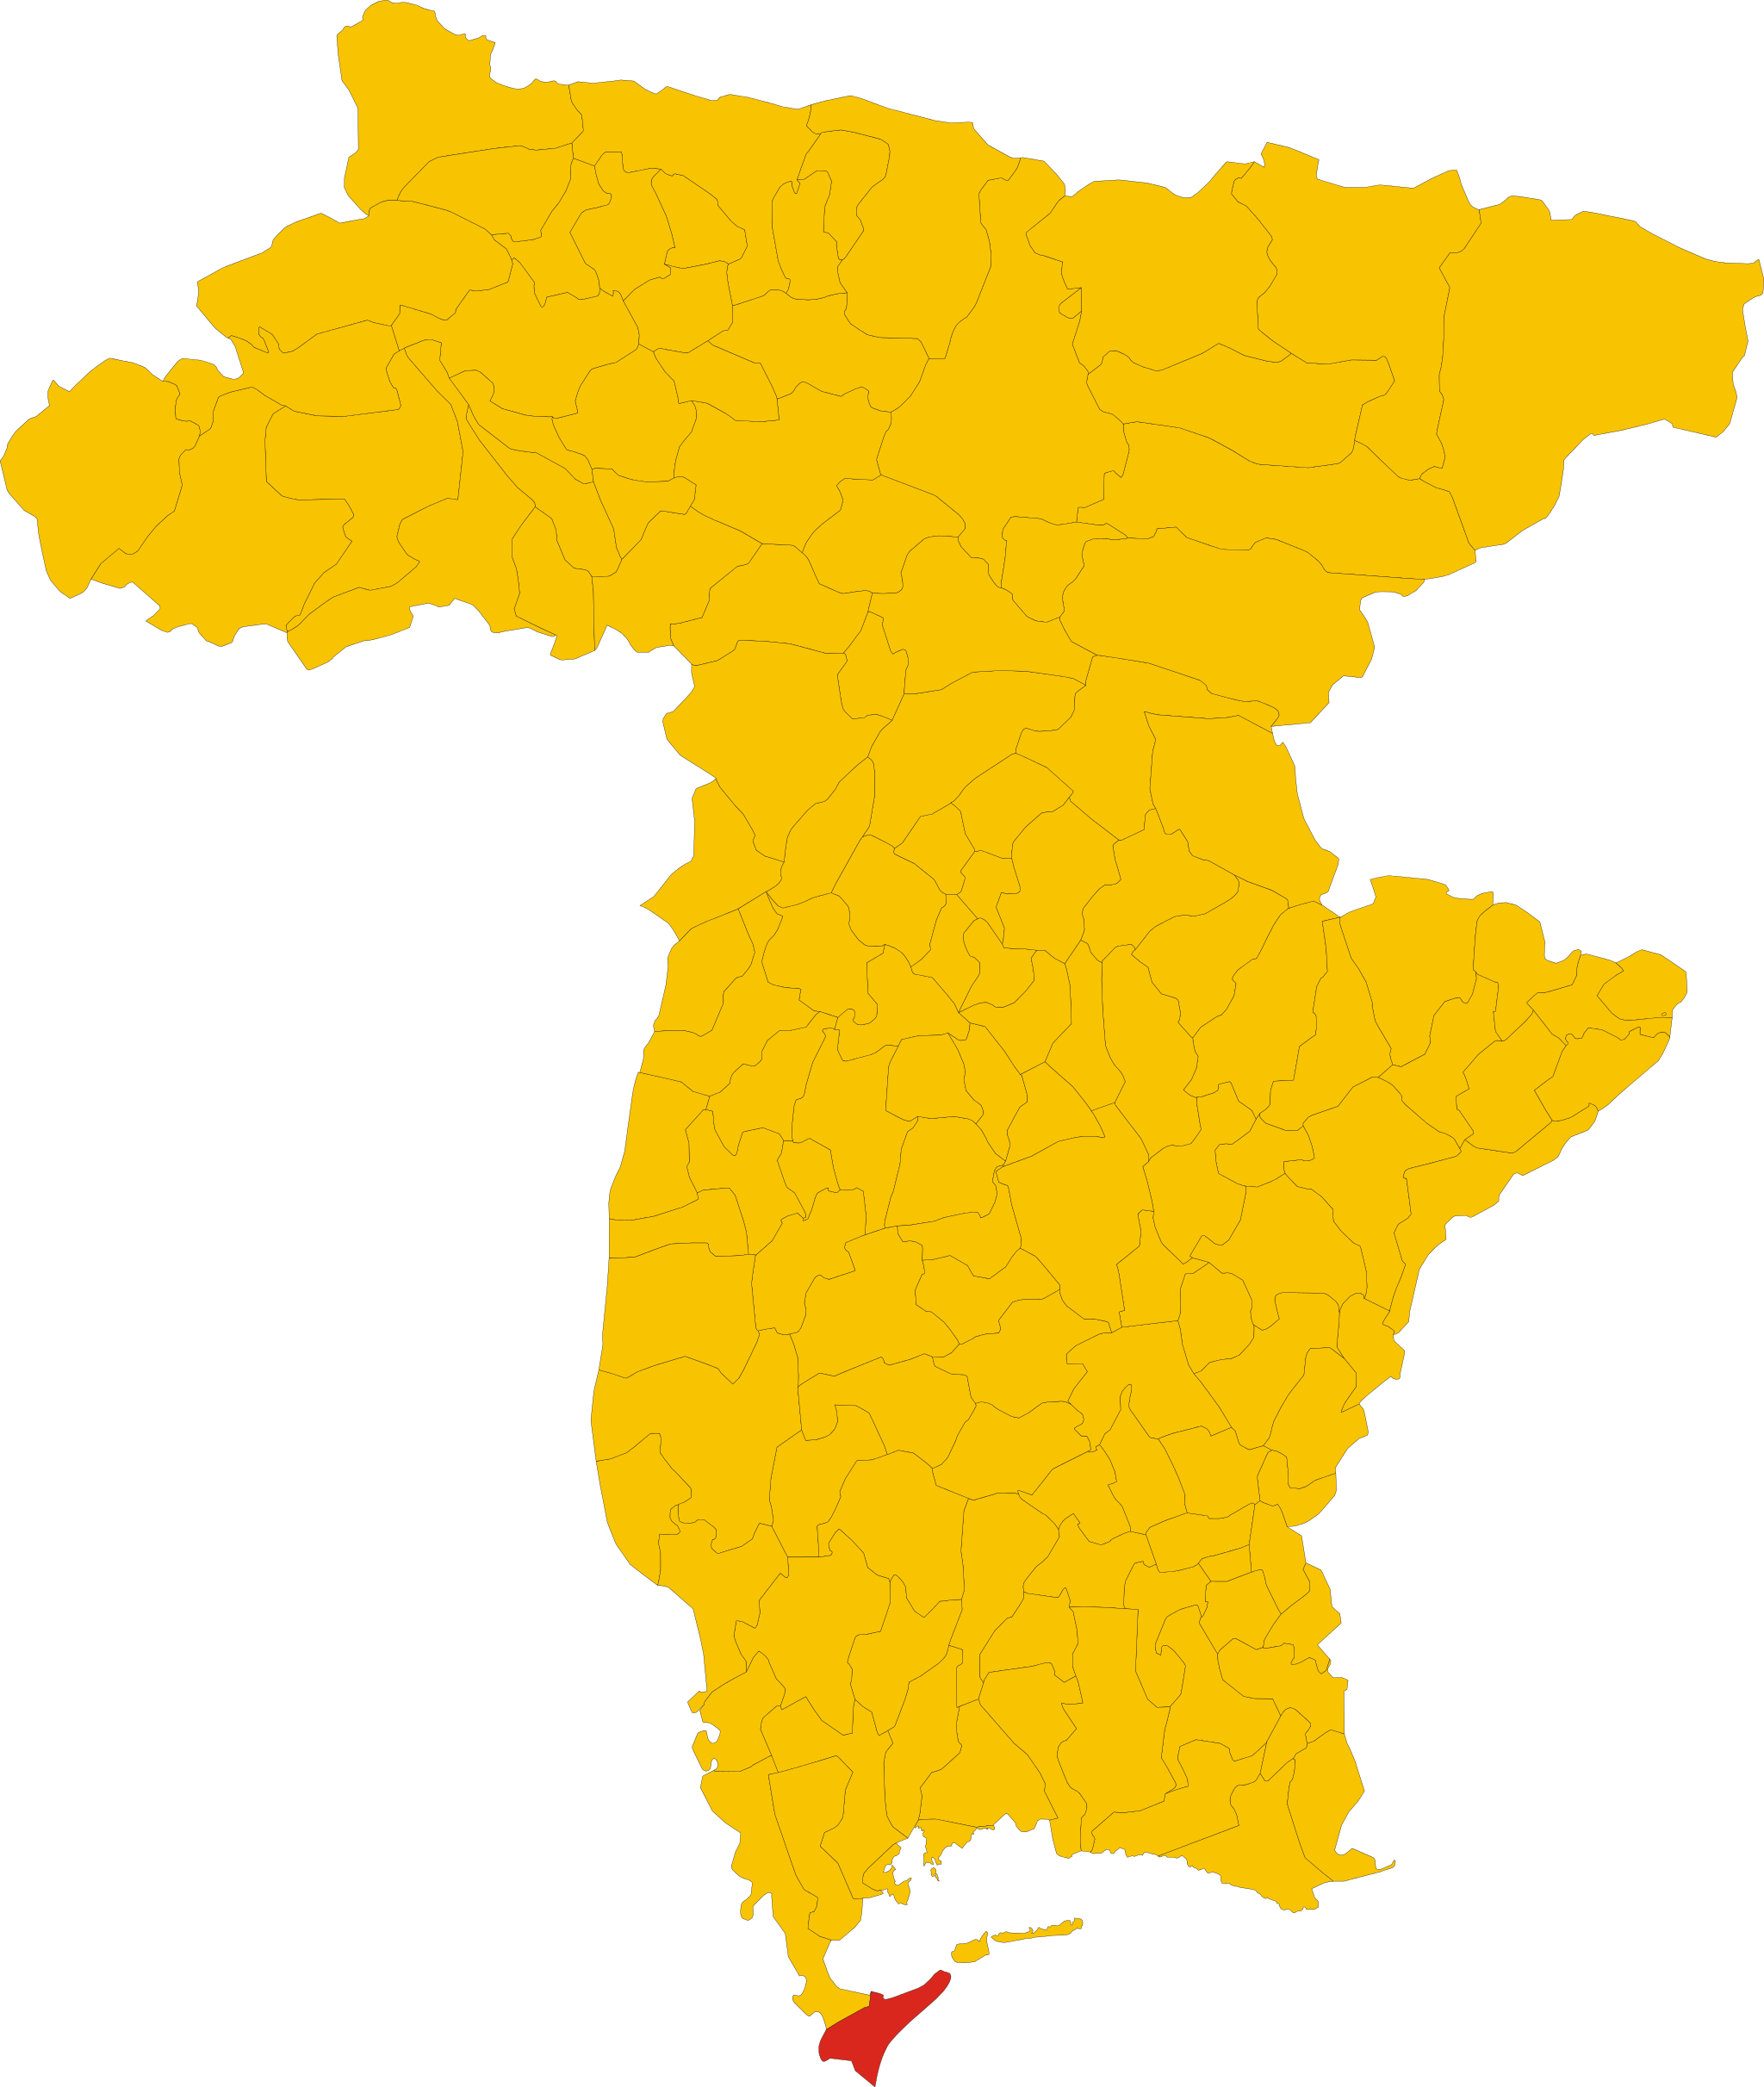 File:Map of comune of Lignano Sabbiadoro (province of Udine.